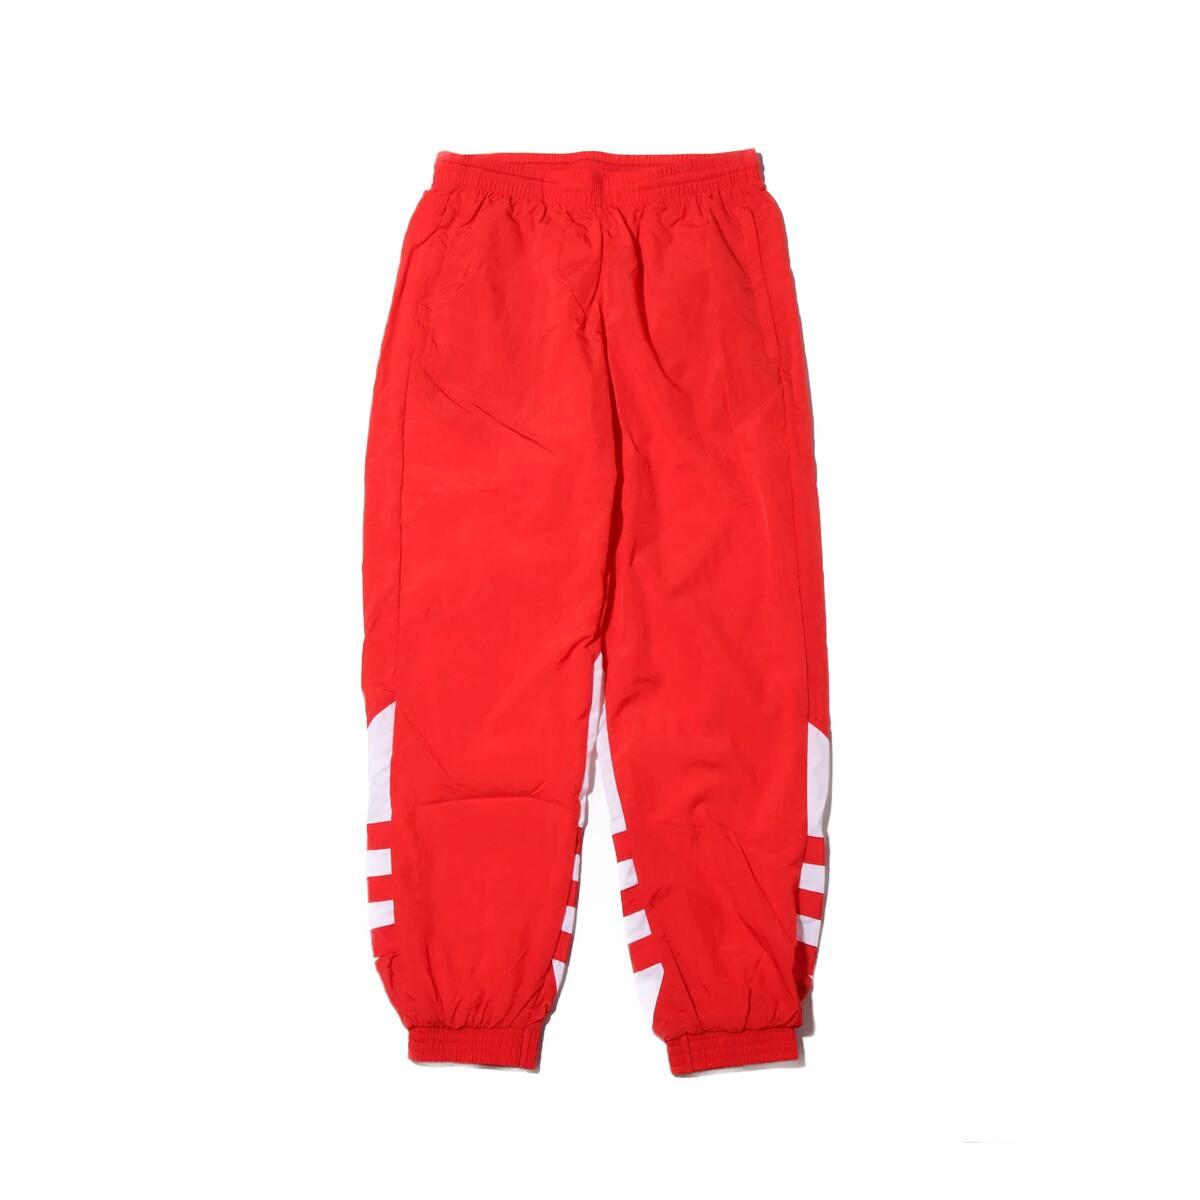 adidas BIG TREFOIL TRACK PANTS MEN LUSH RED 20SS-I_photo_large